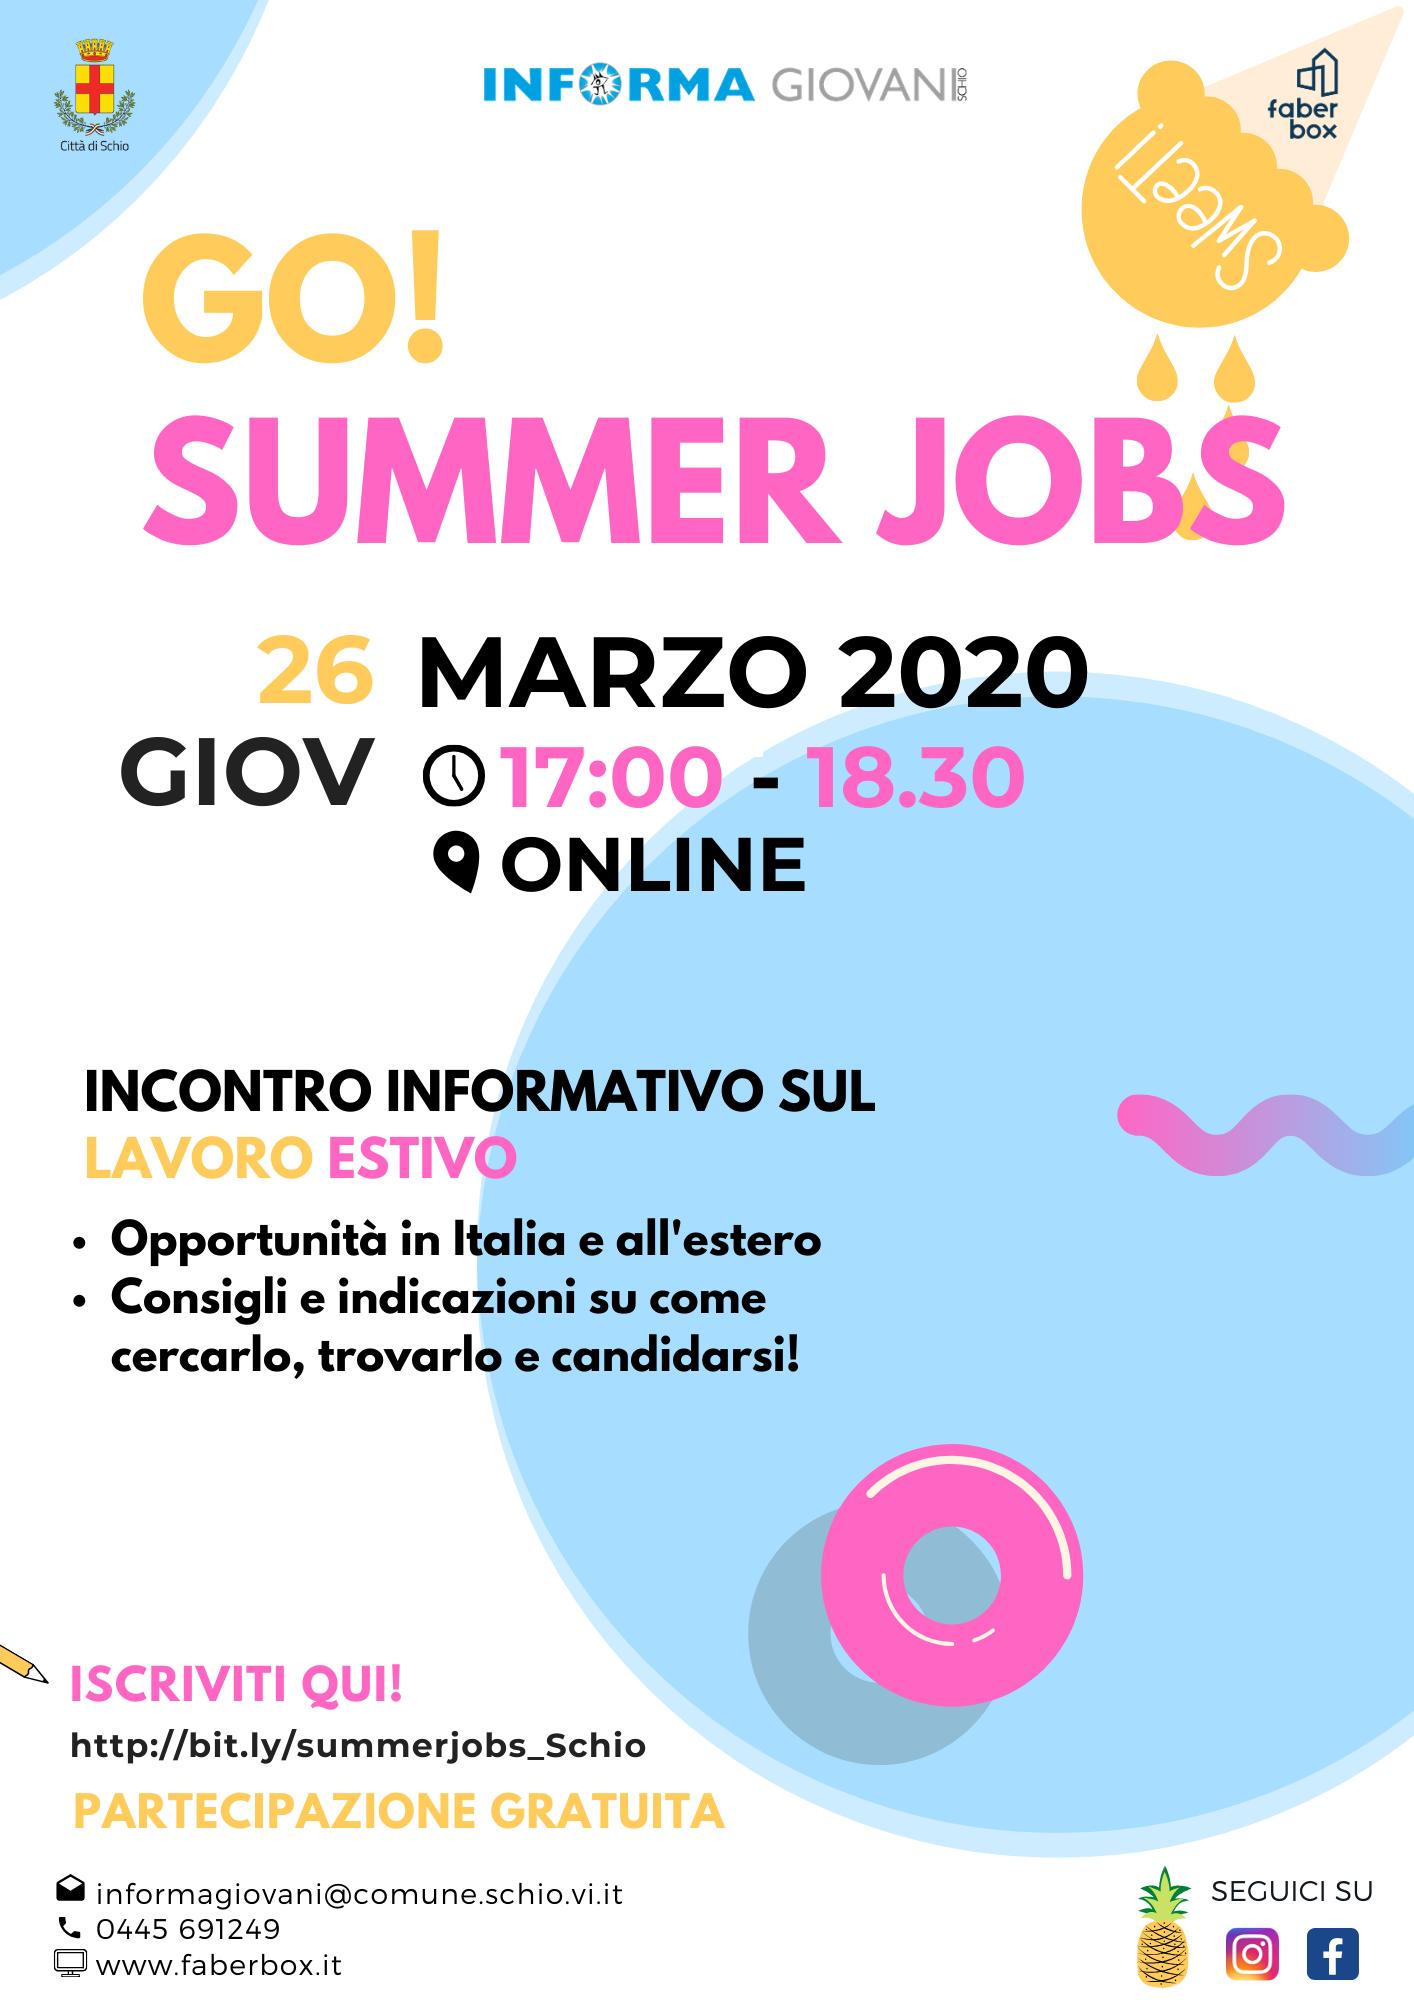 Go! Summer jobs